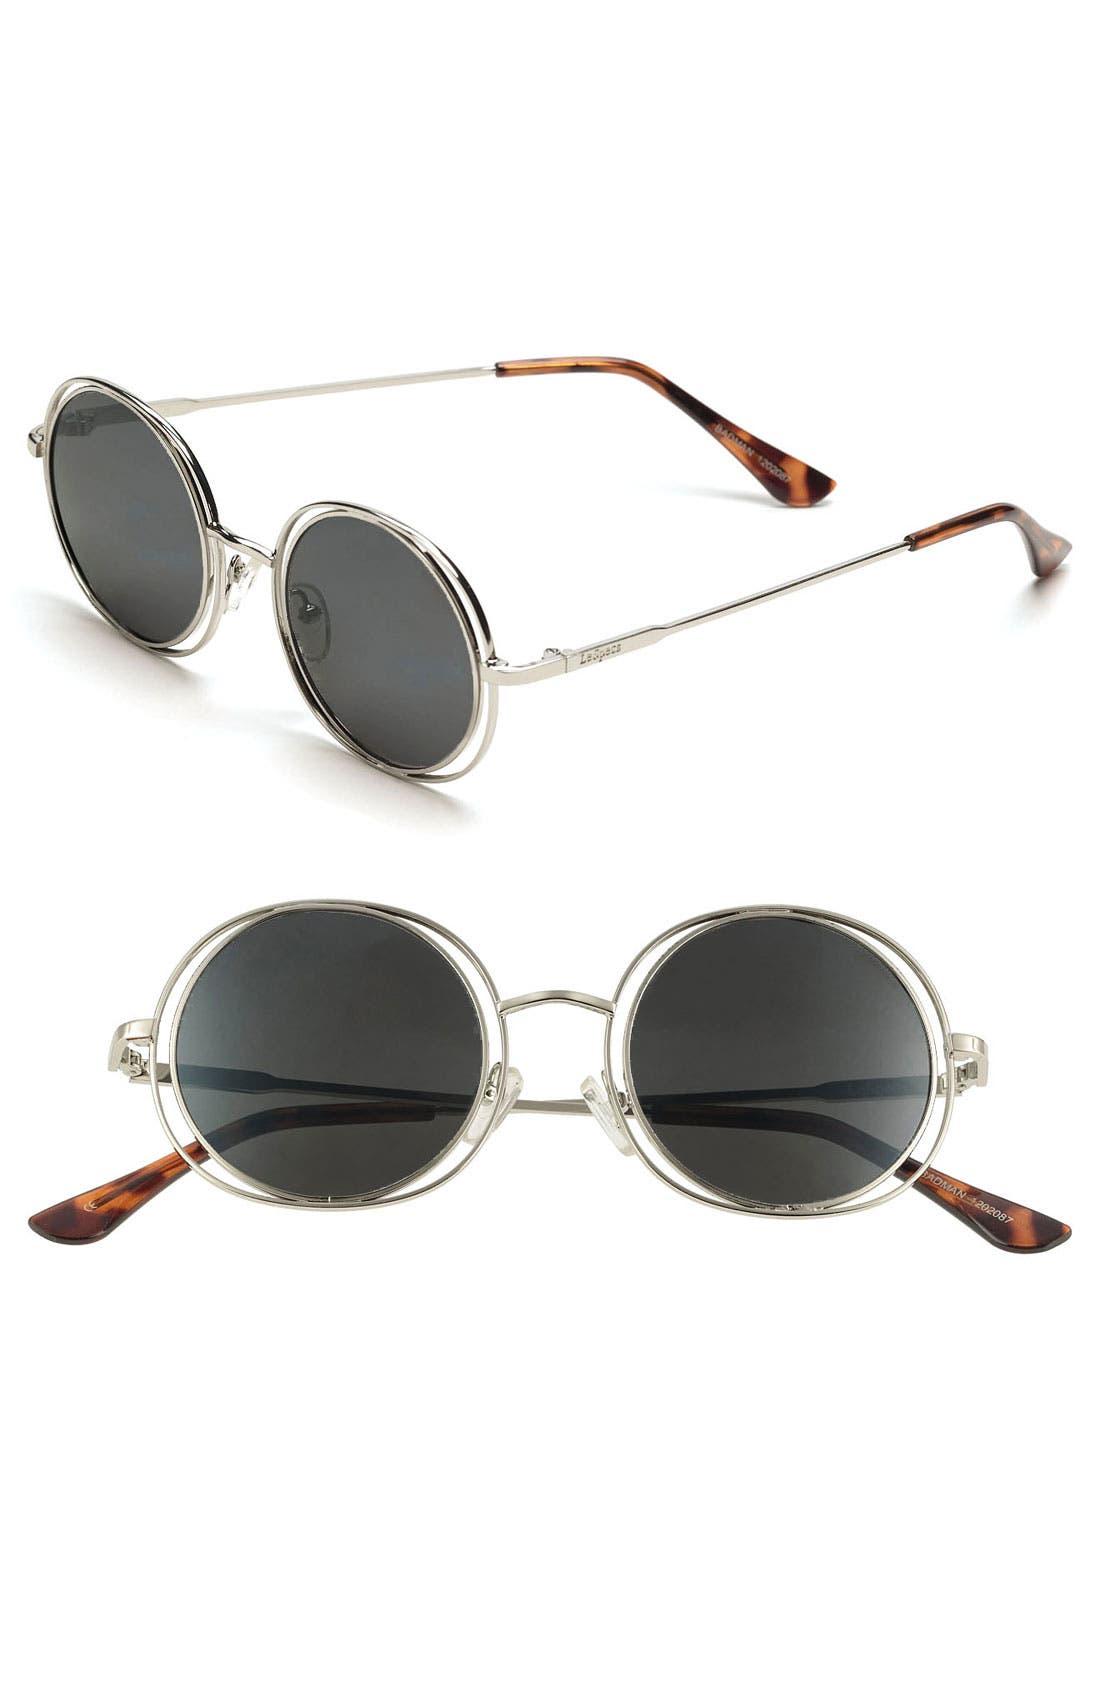 Alternate Image 1 Selected - Le Specs 'Badman' Sunglasses